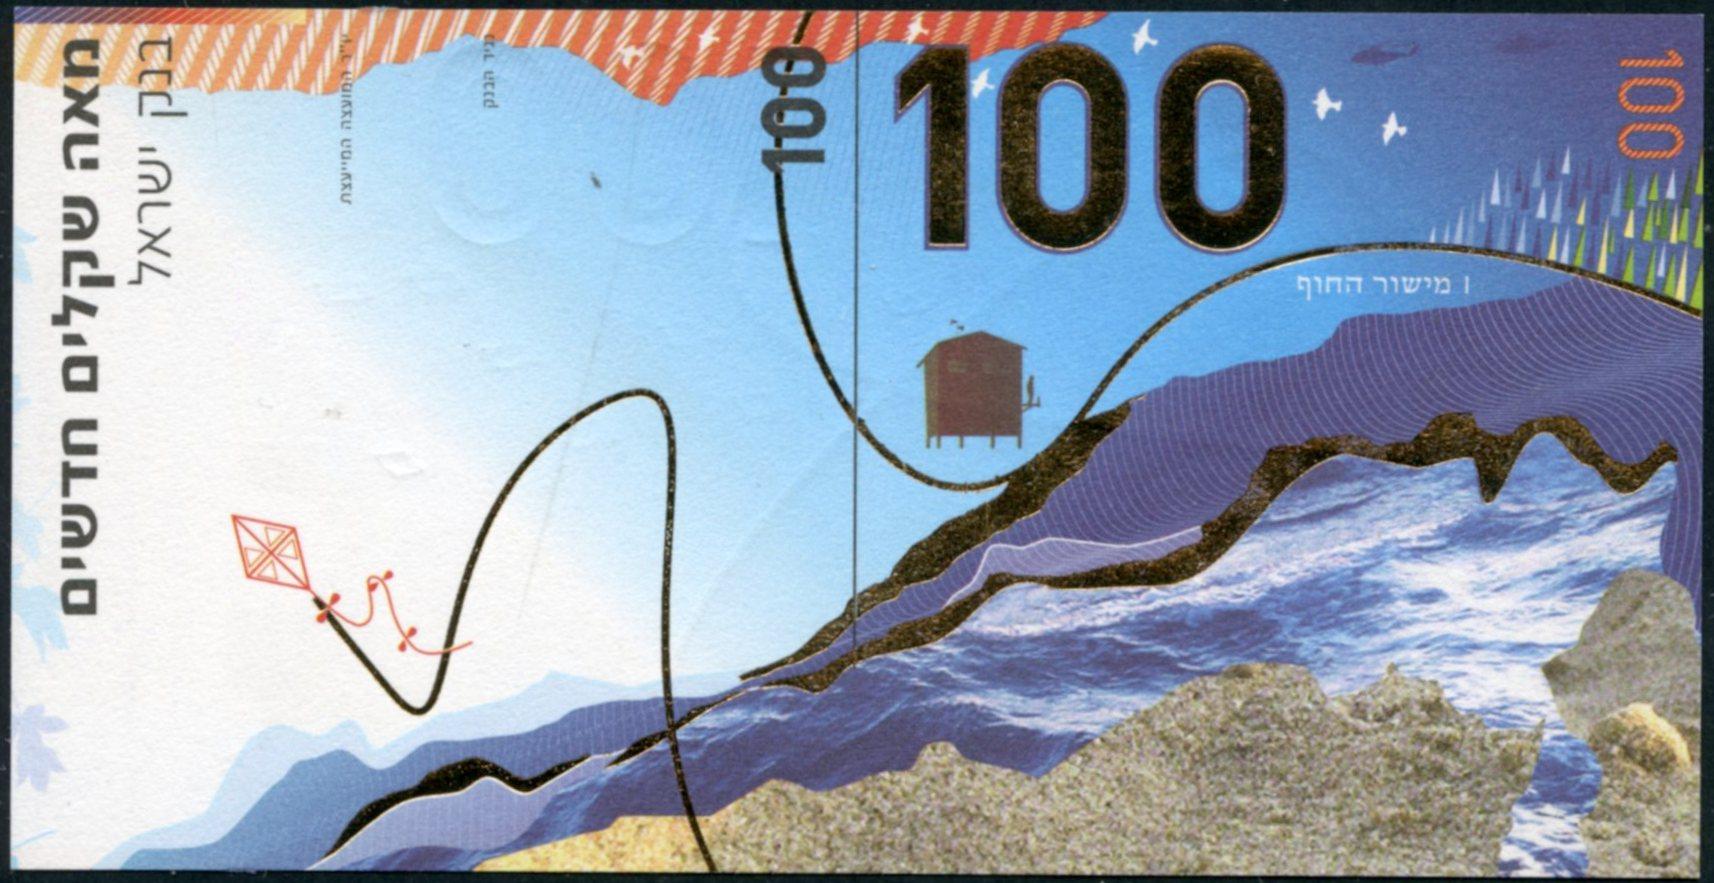 Lot 450 - banknotes  -  Tel Aviv Stamps Ltd. Auction #45